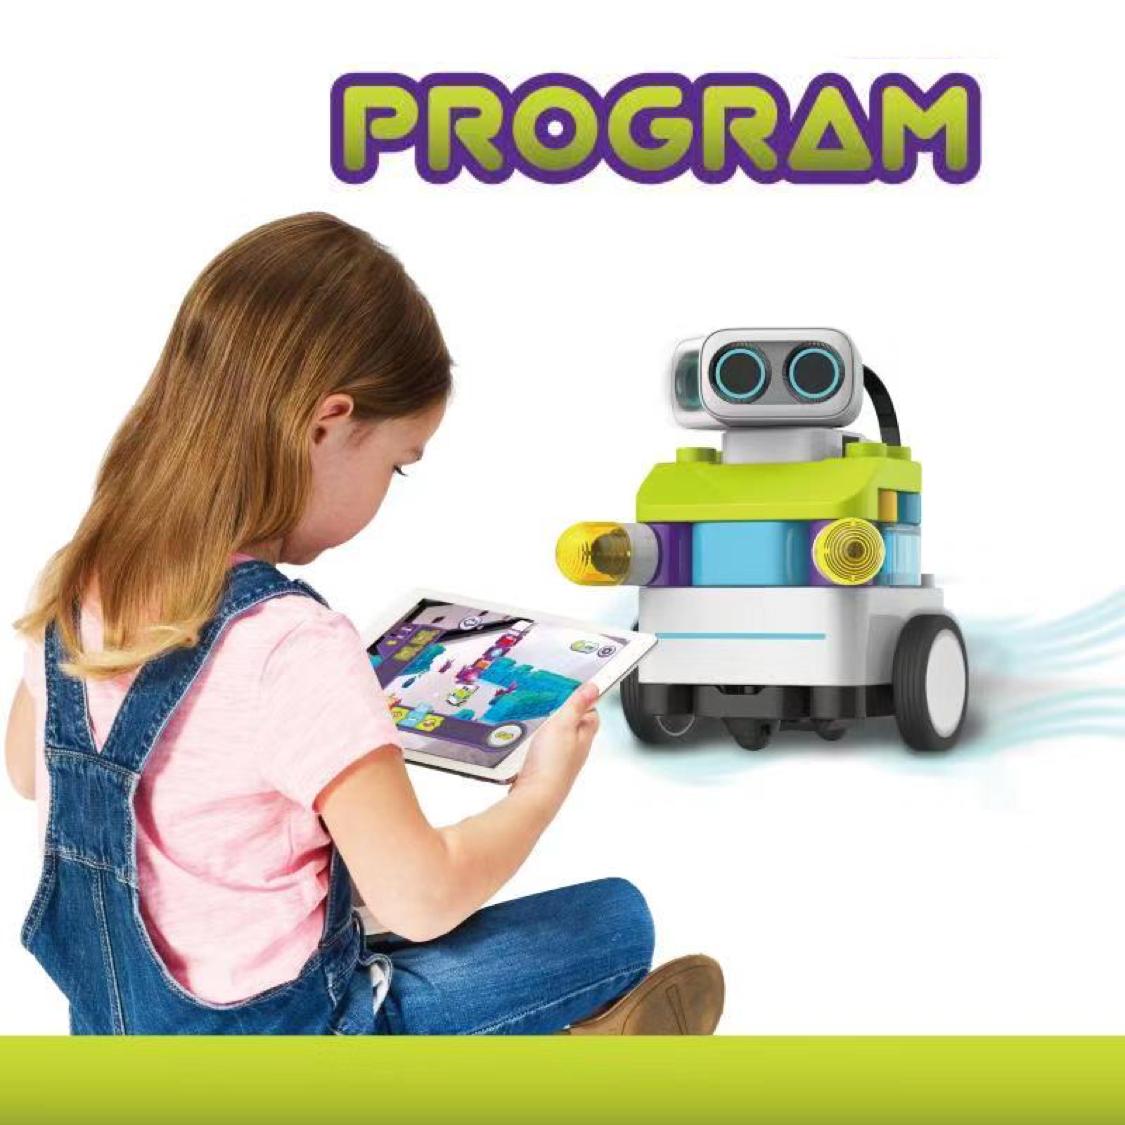 Copy of PaiBotz Program v.2.png